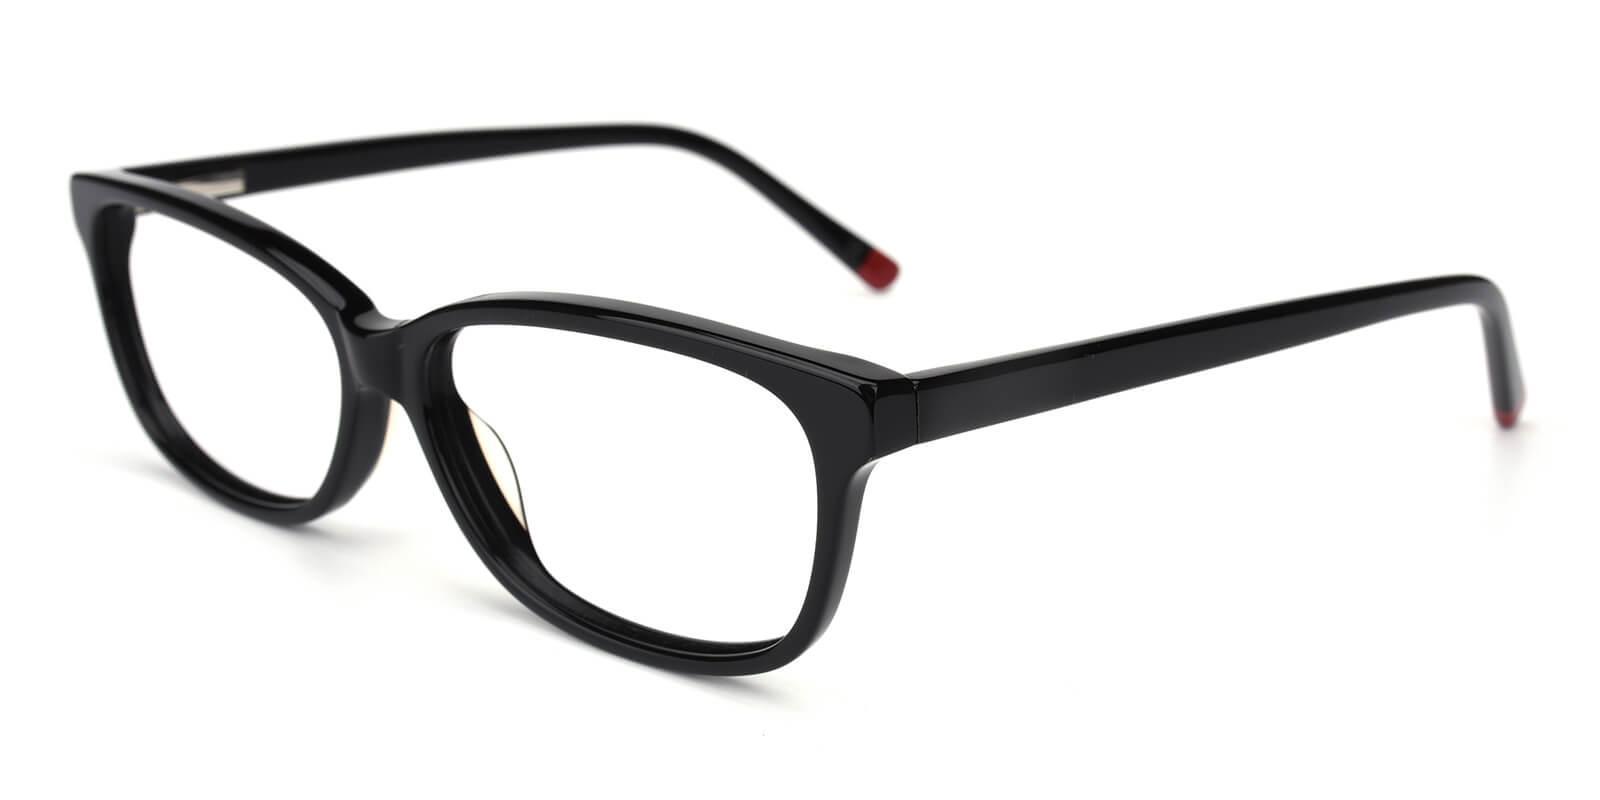 Zion-Black-Cat-Acetate-Eyeglasses-detail